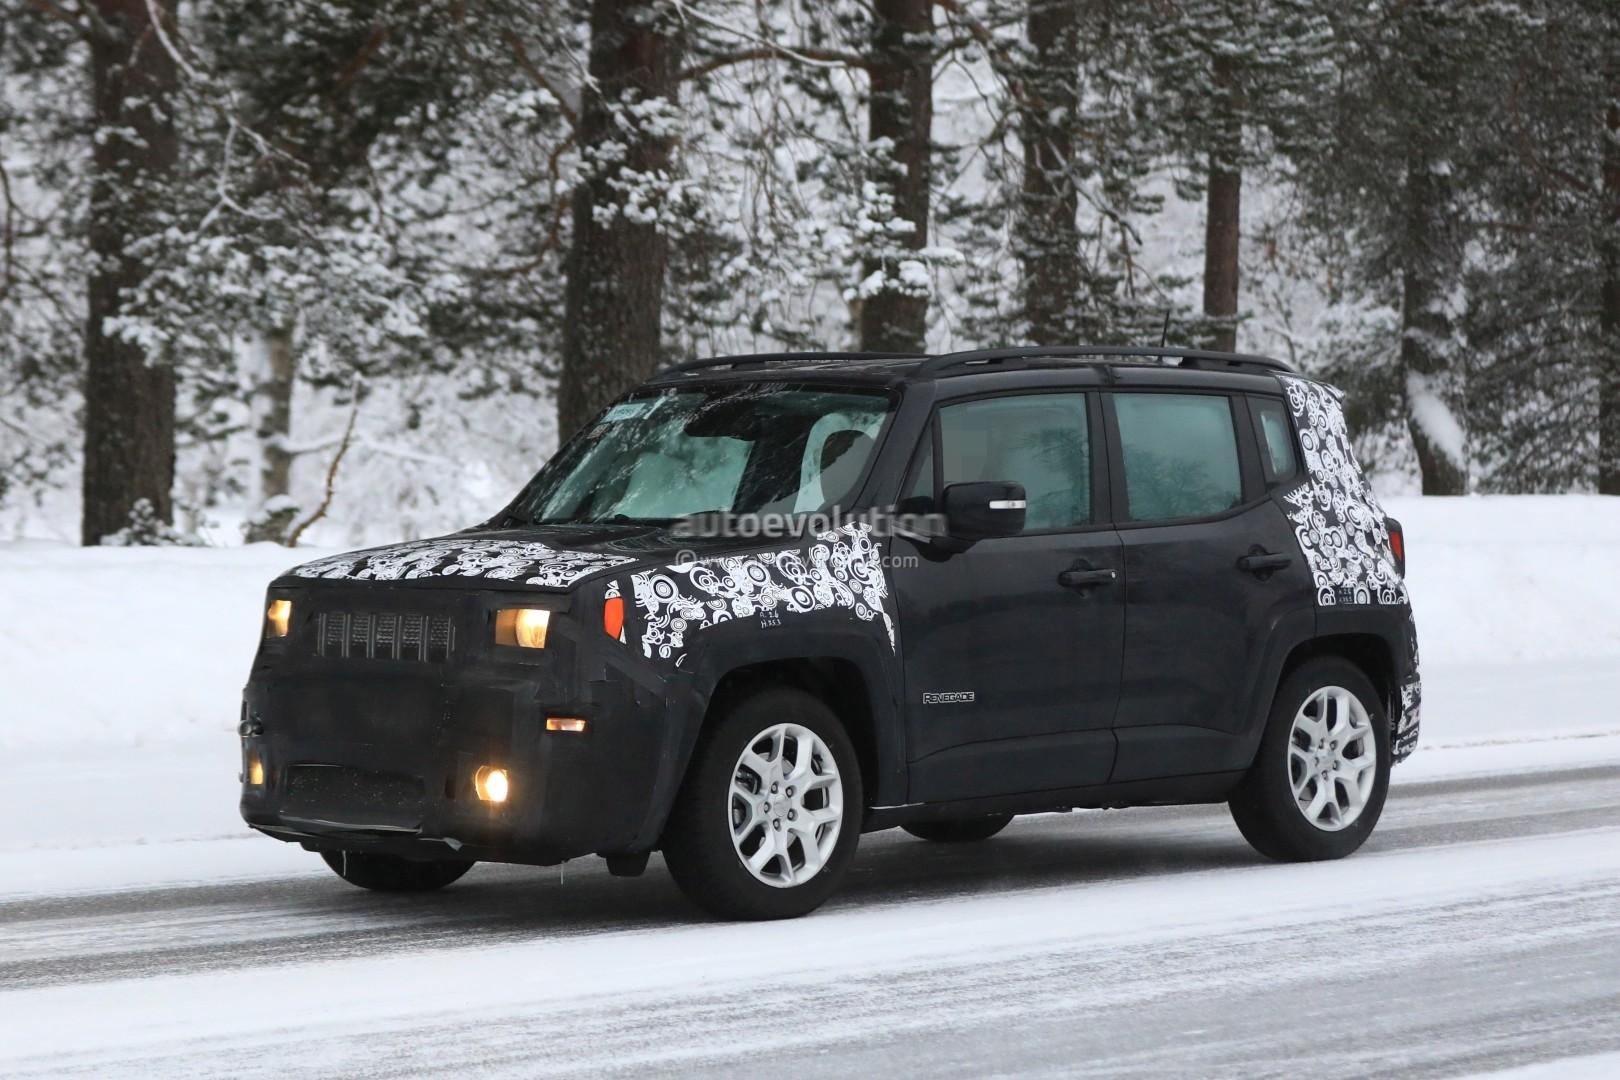 Jeep Renegade Interior >> Spyshots: 2019 Jeep Renegade Facelift Reveals Updated ...